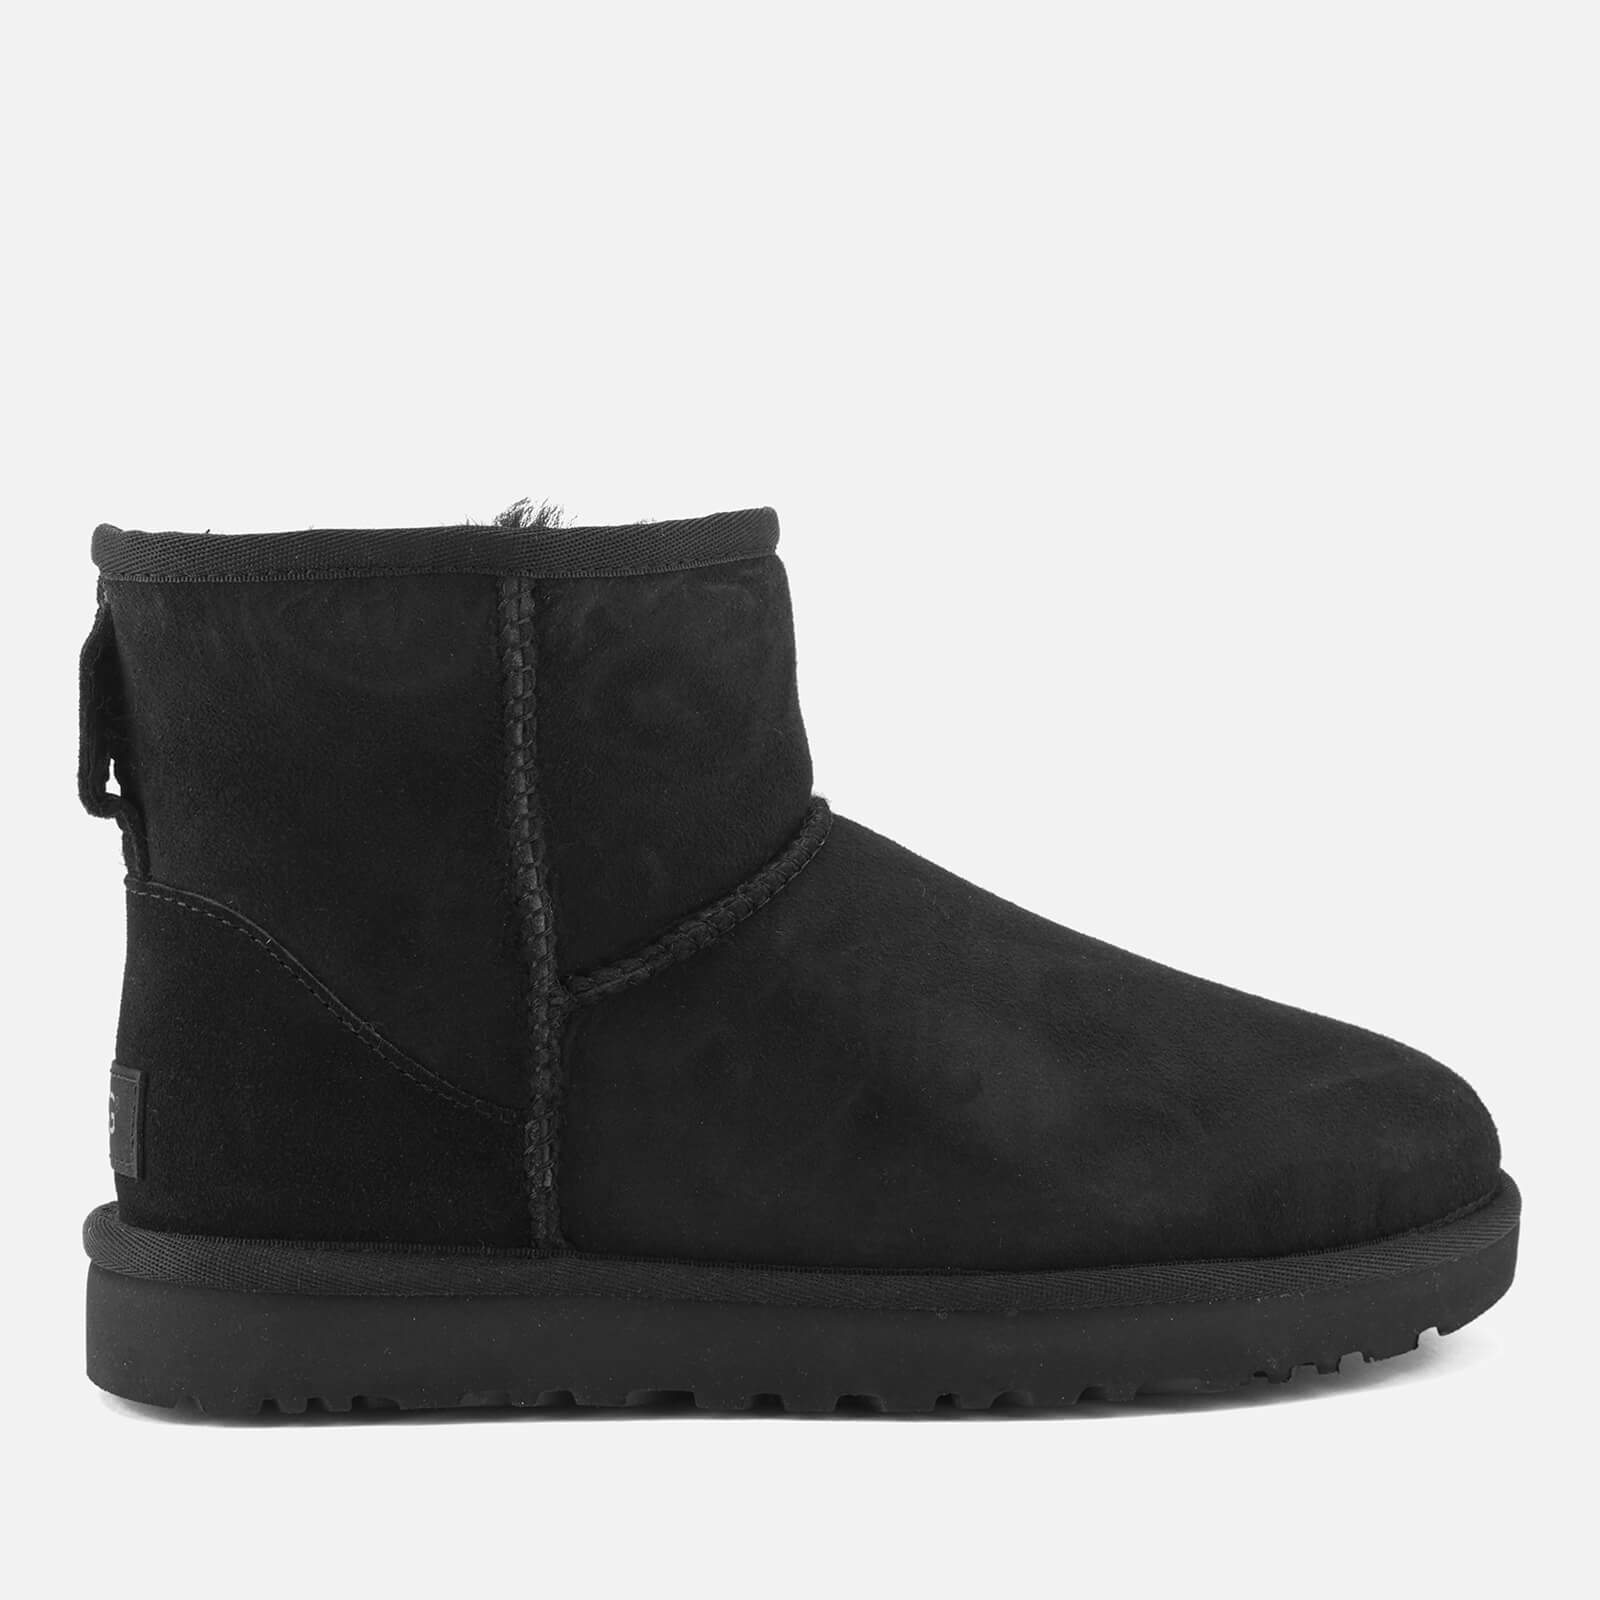 cc26c397e31 UGG Women's Classic Mini II Sheepskin Boots - Black